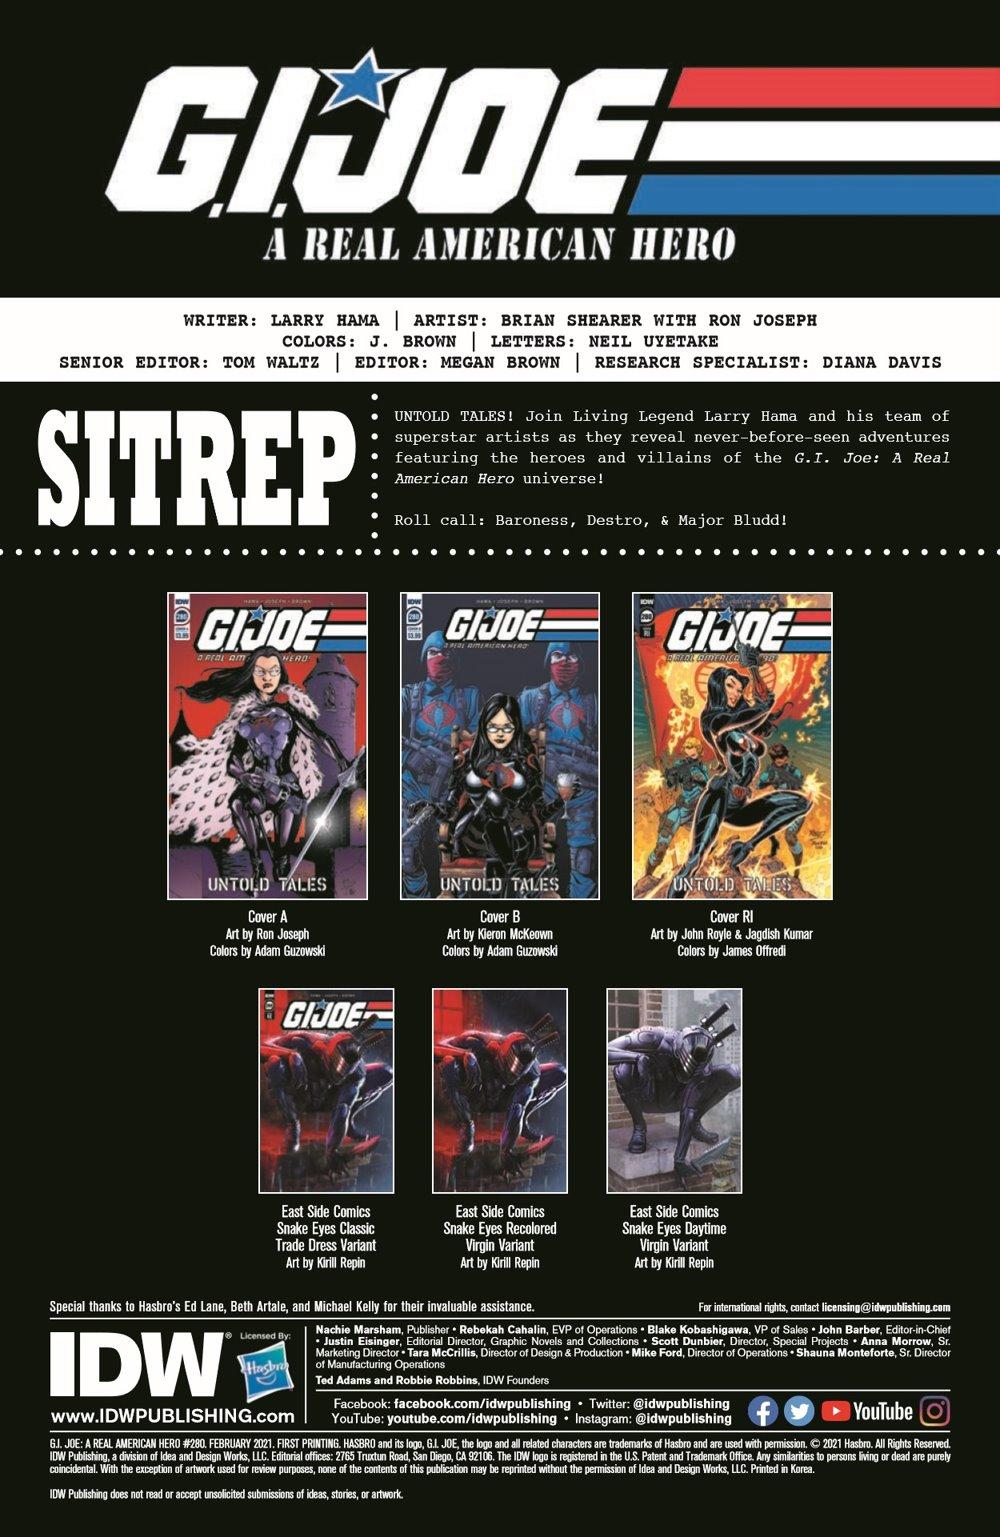 GIJoeRAH280-pr-2 ComicList Previews: G.I. JOE A REAL AMERICAN HERO #280